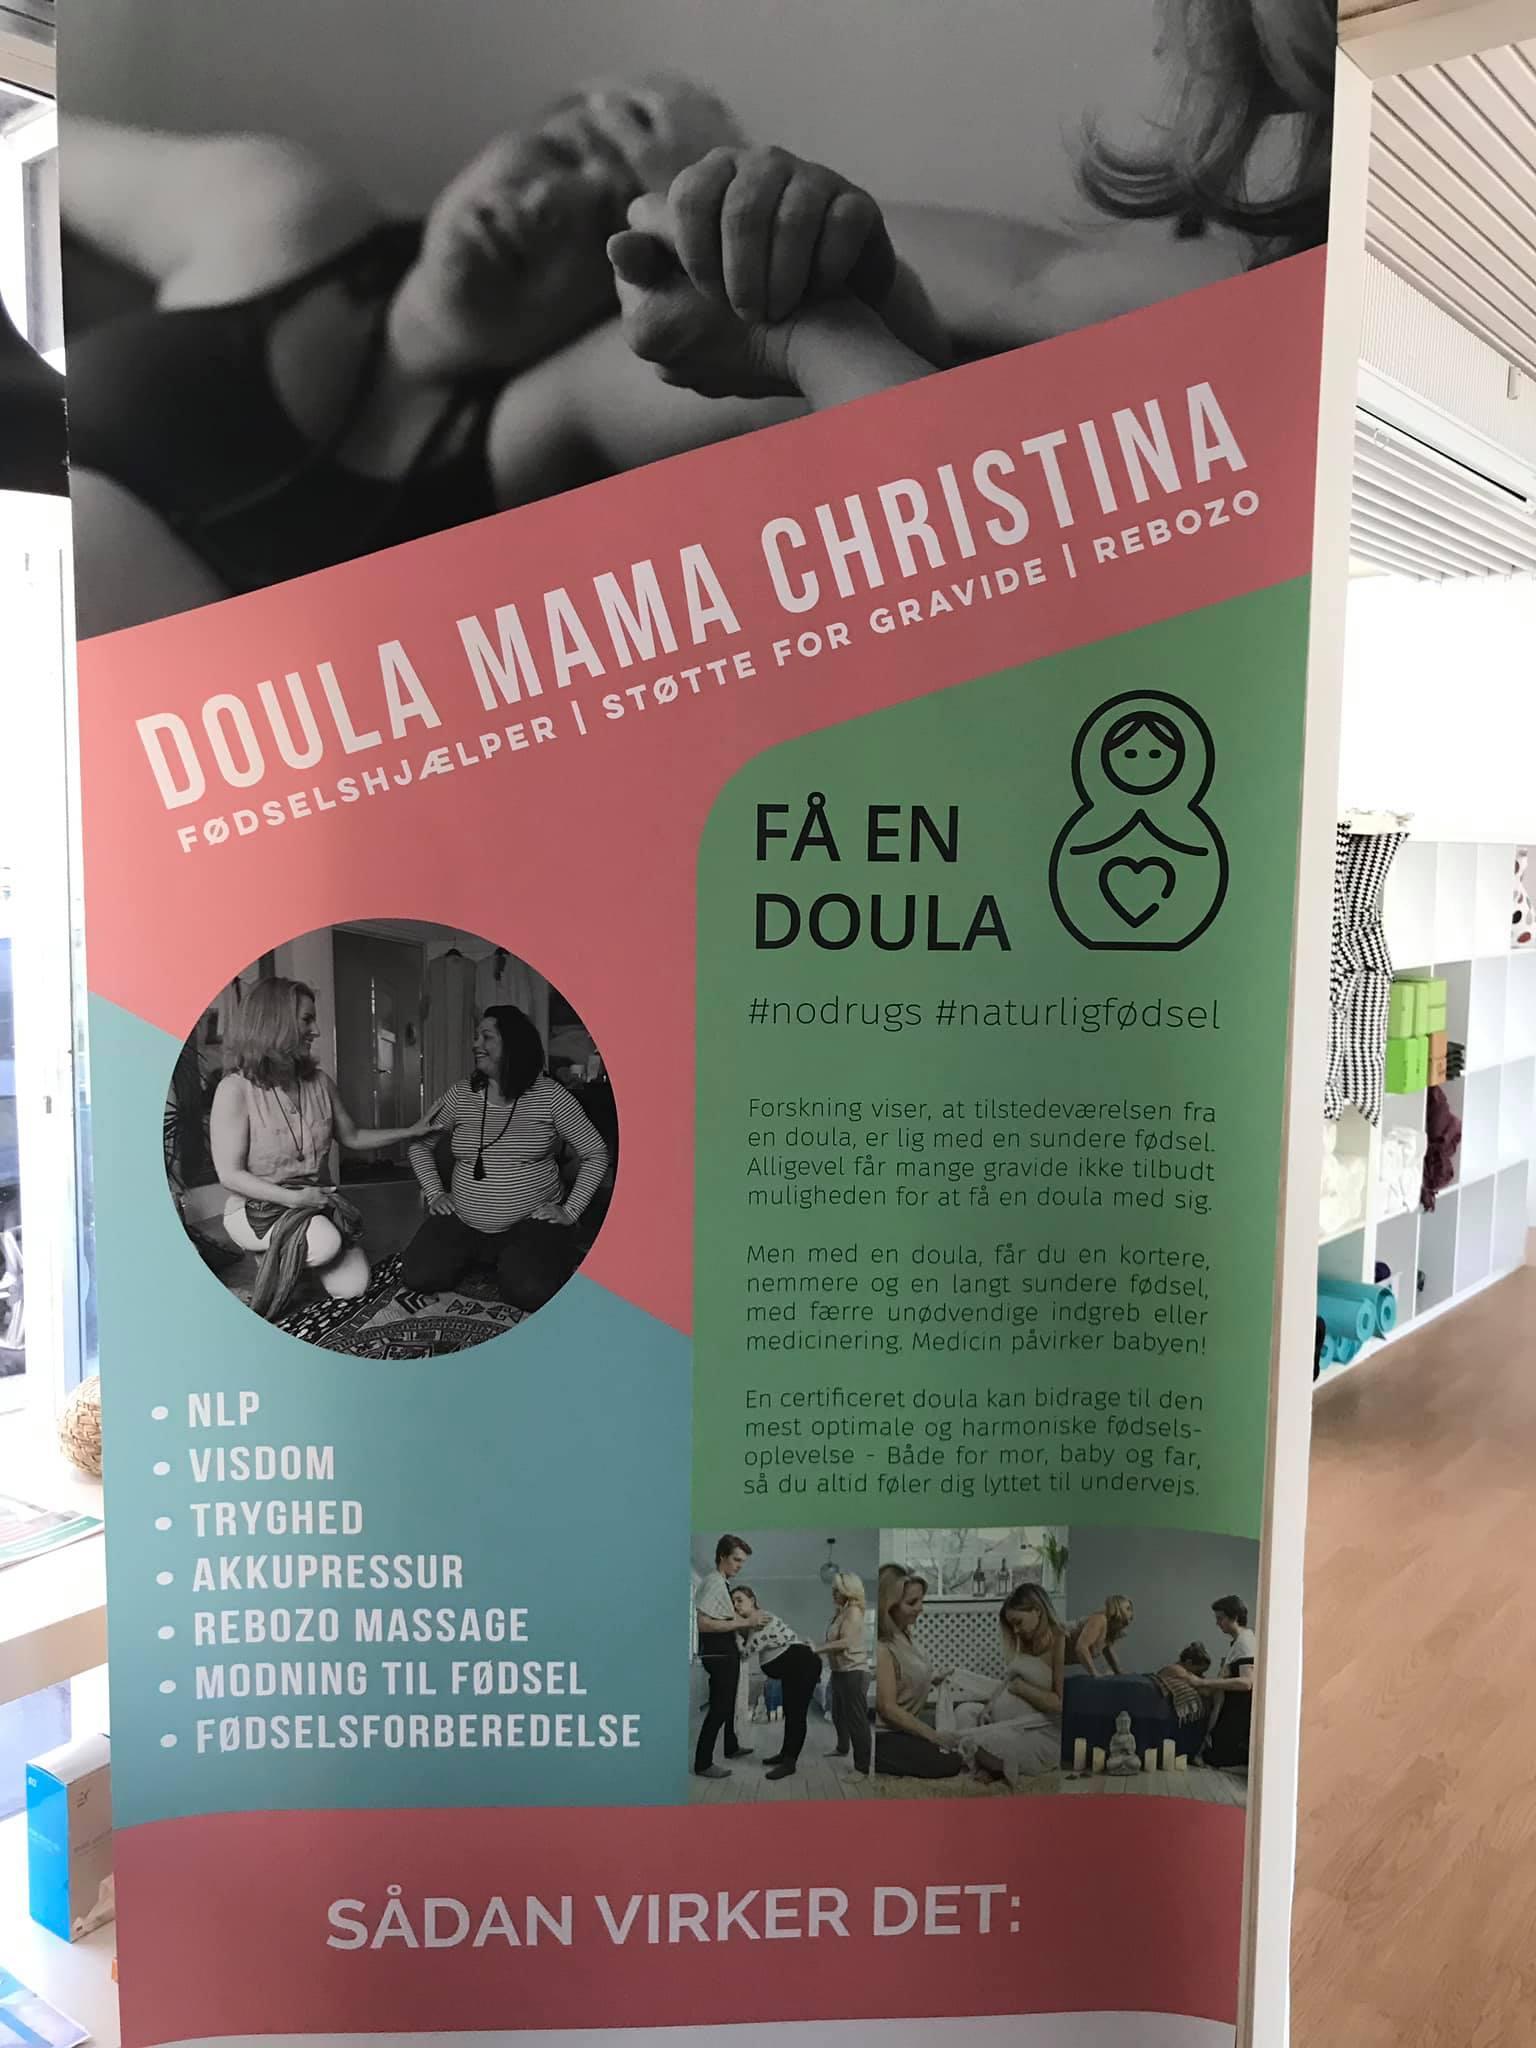 Pull-up til messestand - Doula Mama Christina